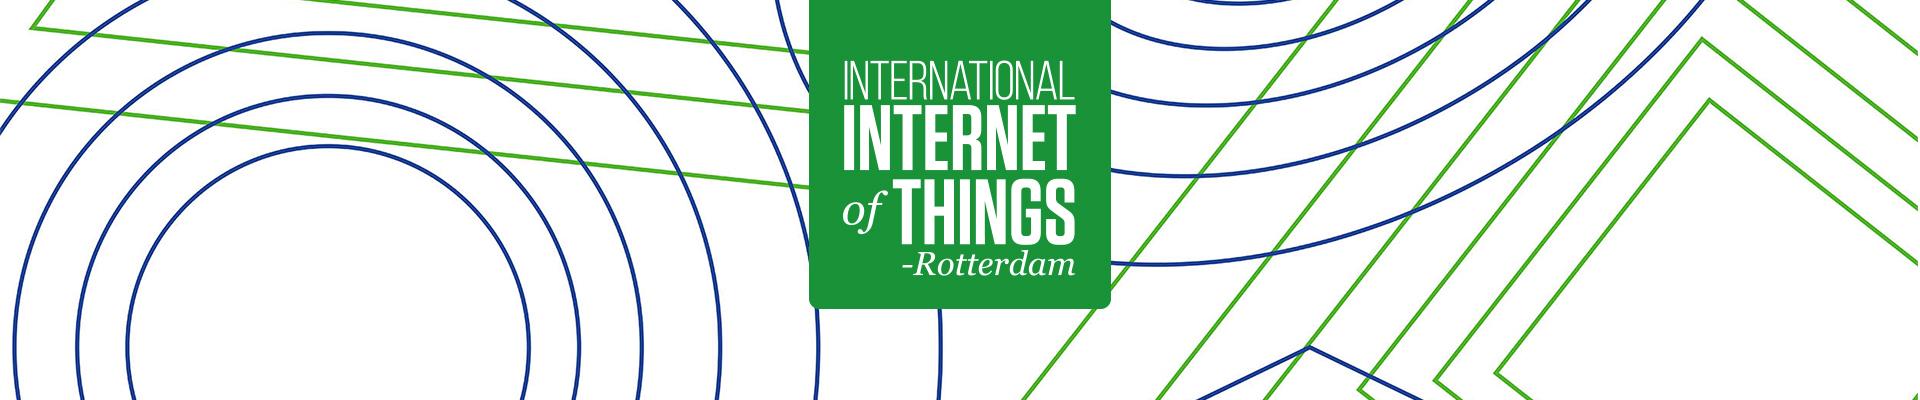 Internet of Things 2019